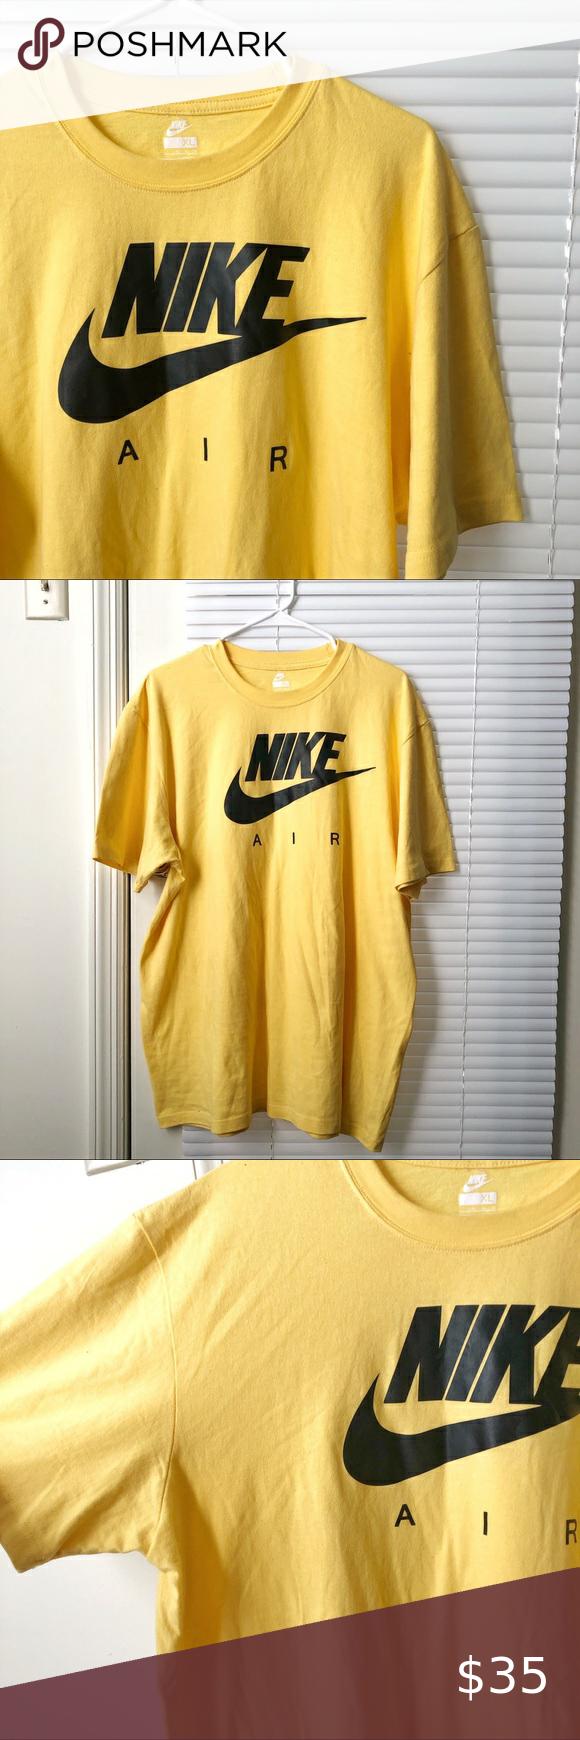 Nike Air Swoosh T Shirt Logo Crewneck Graphic Tee Yellow T Shirt Graphic Tees Tshirt Logo [ 1740 x 580 Pixel ]